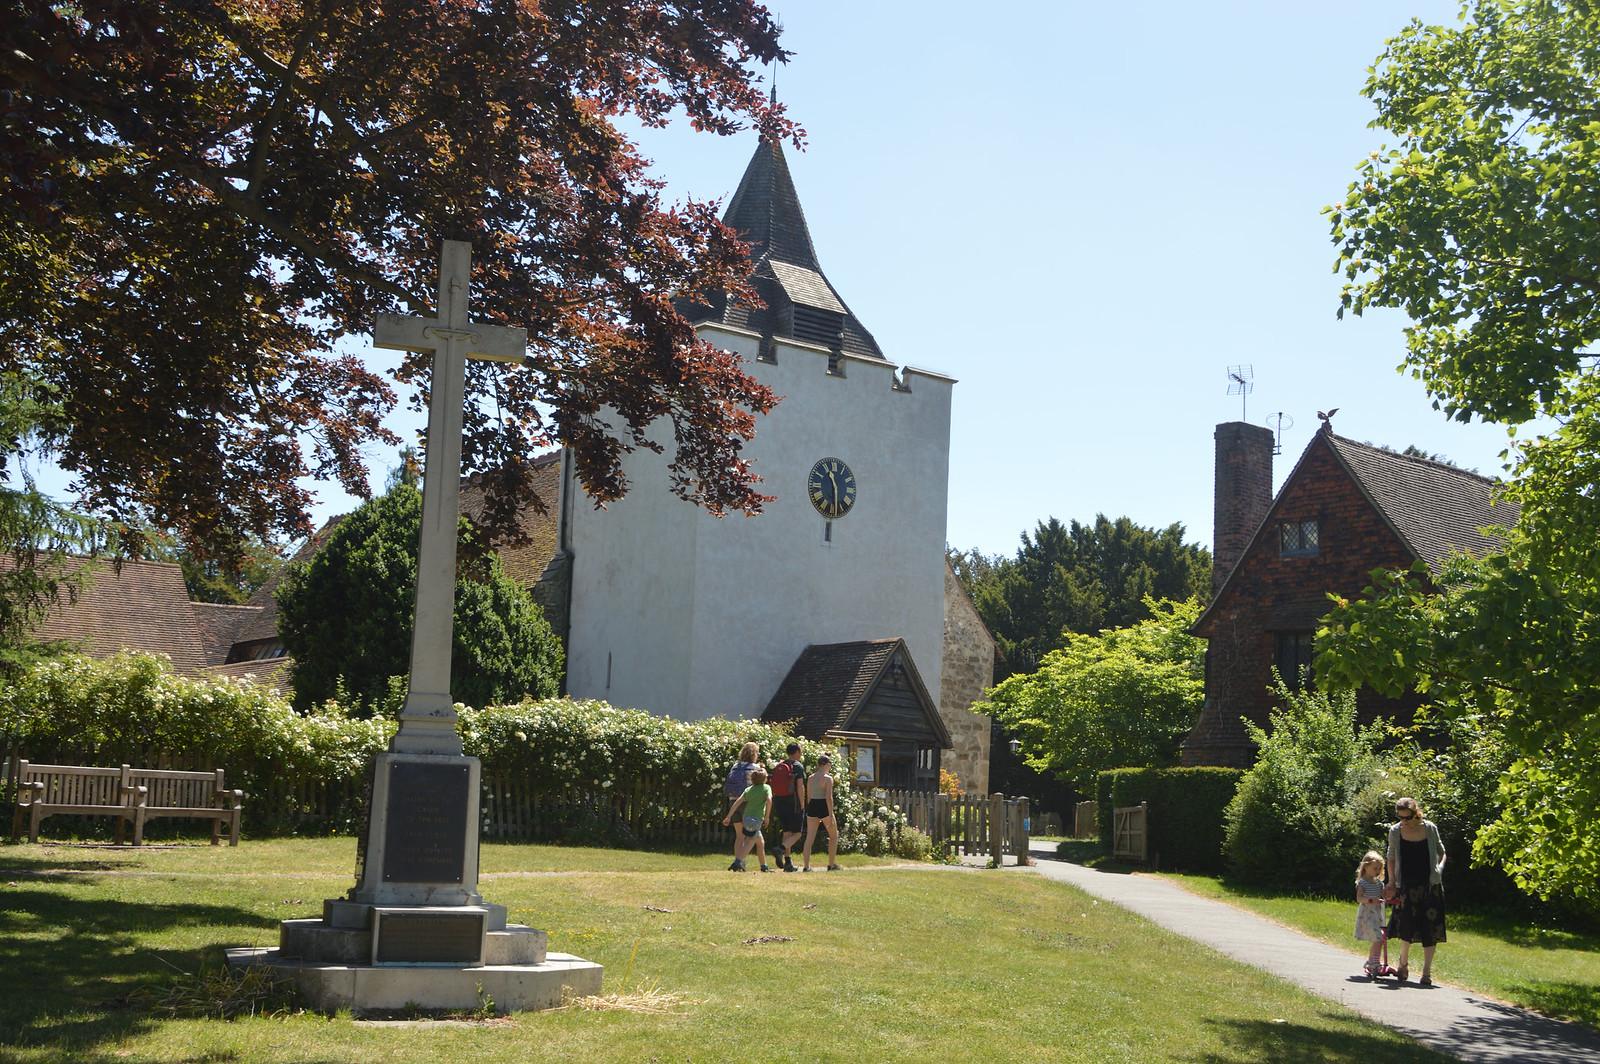 Otford church and war memorial